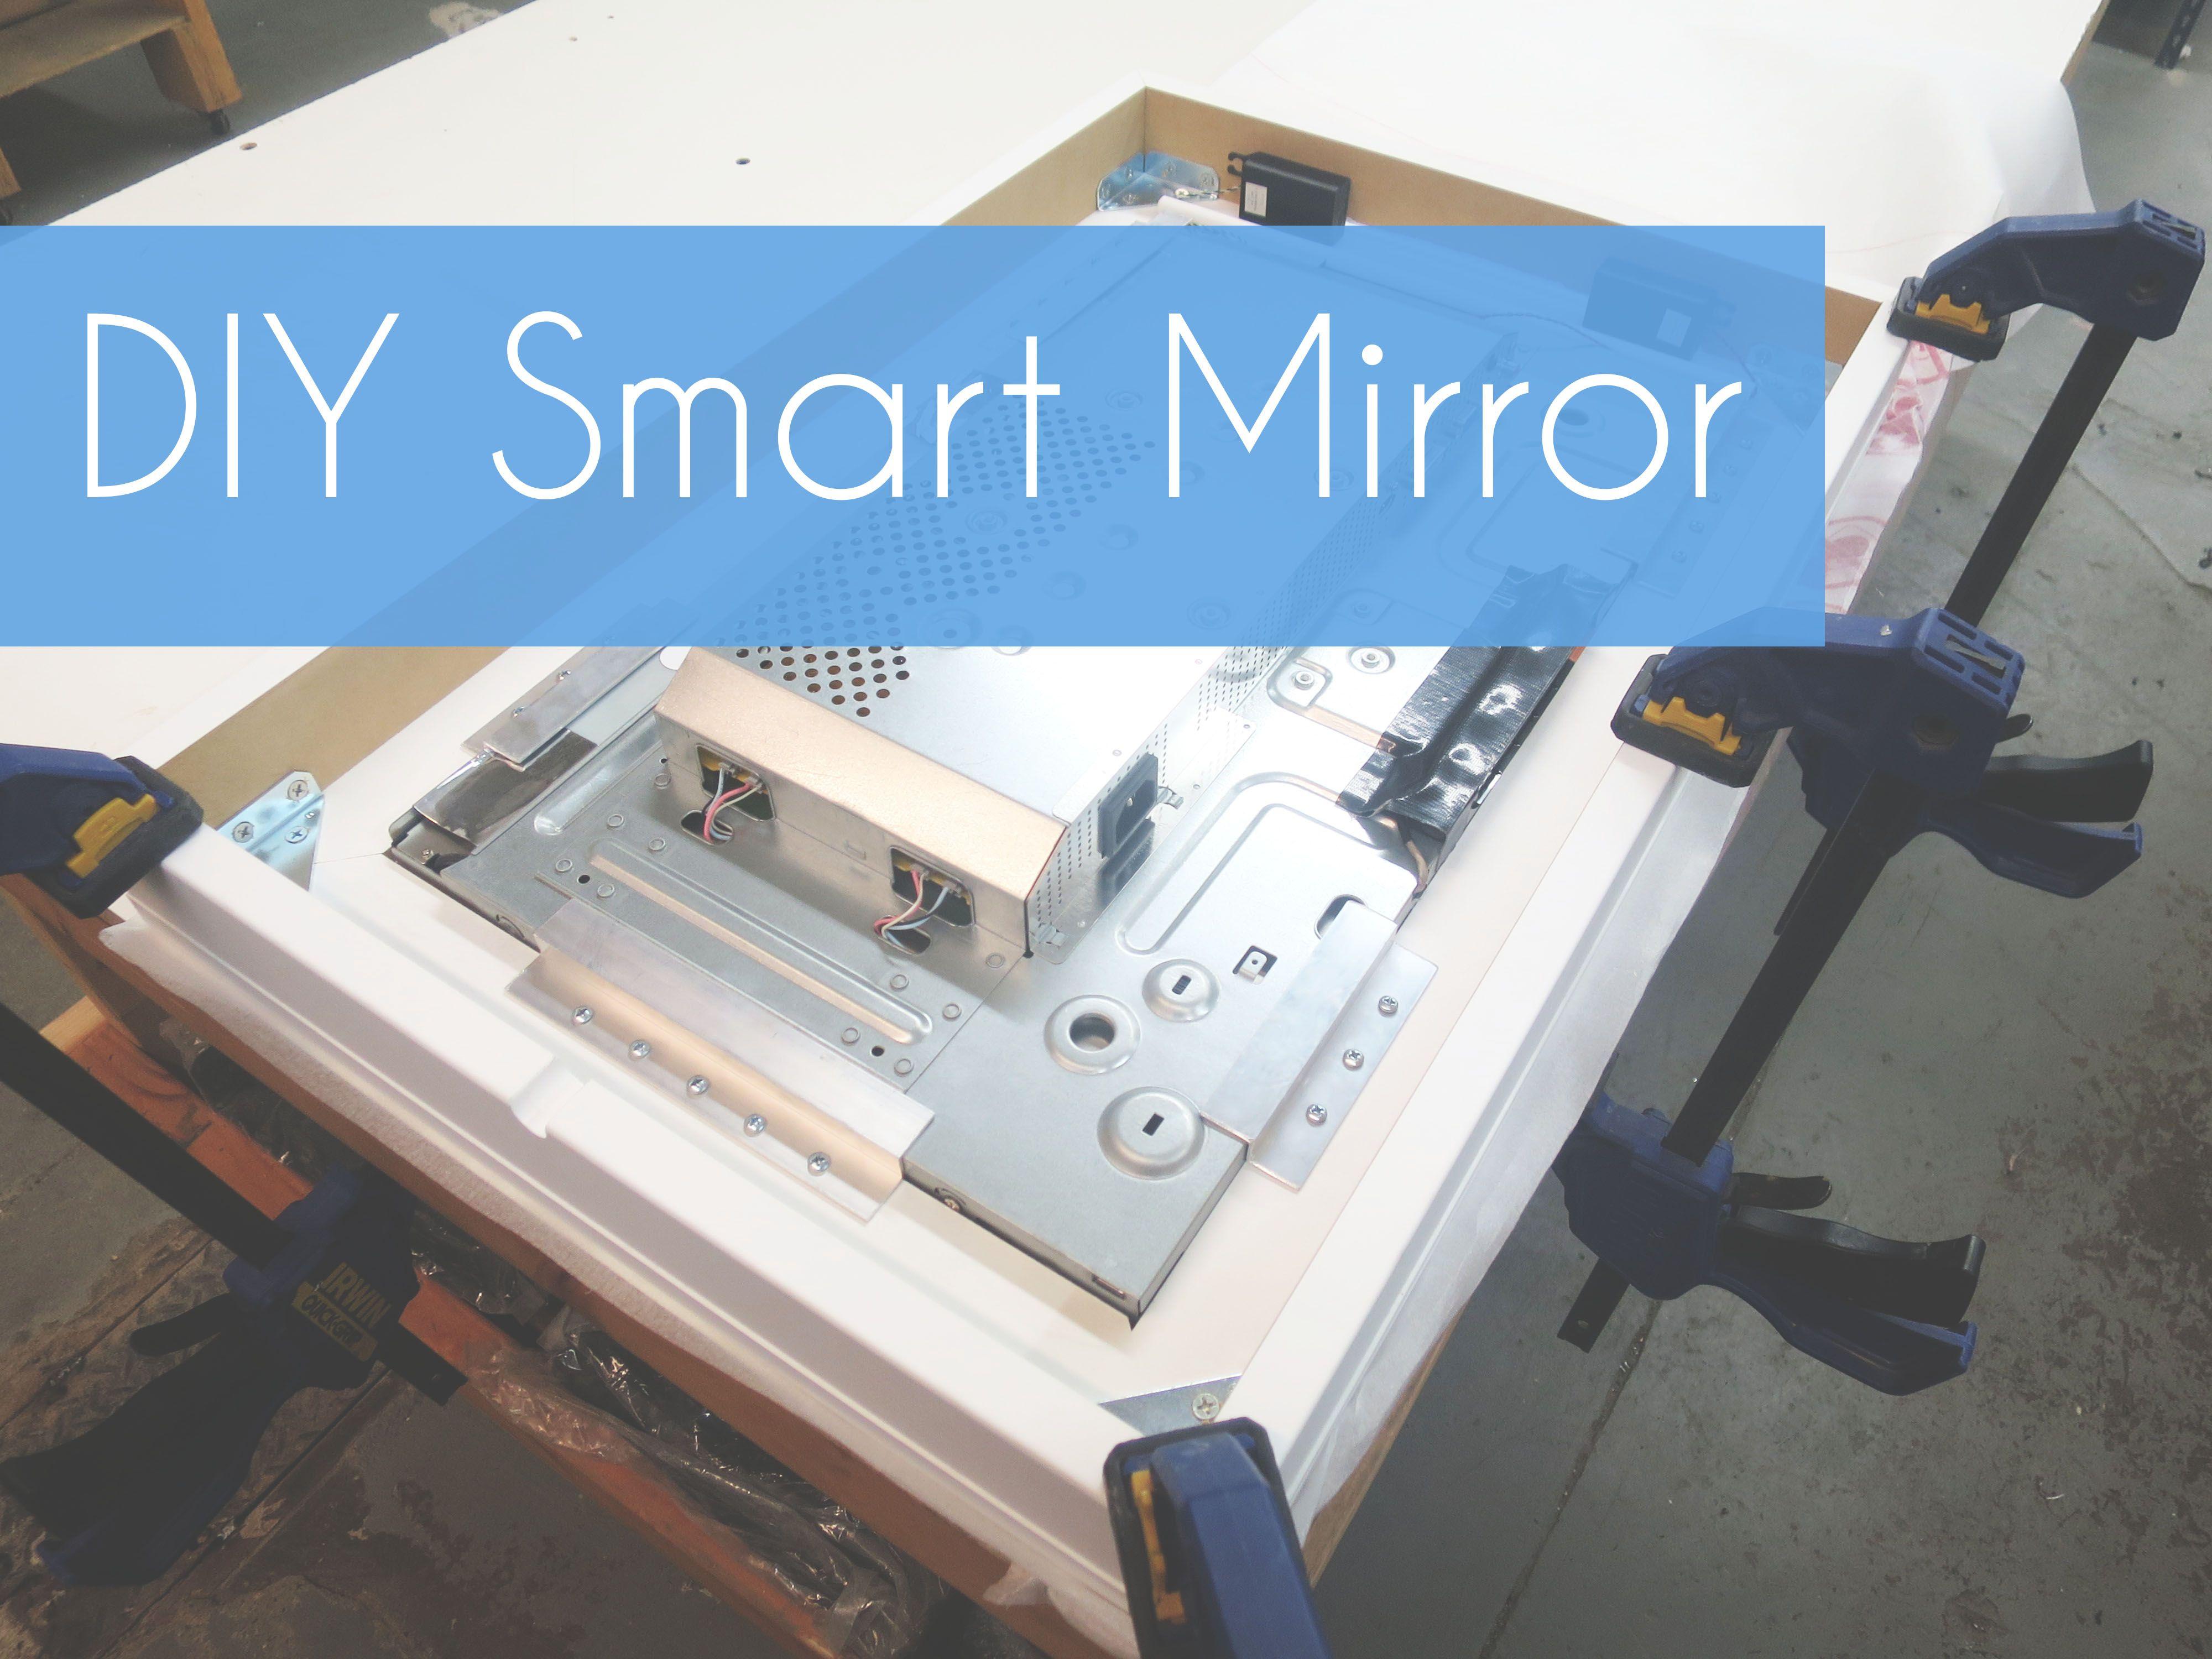 Diy Mirror Projects Smart Mirror Diy Smart Mirror Pinterest Raspberry Pi